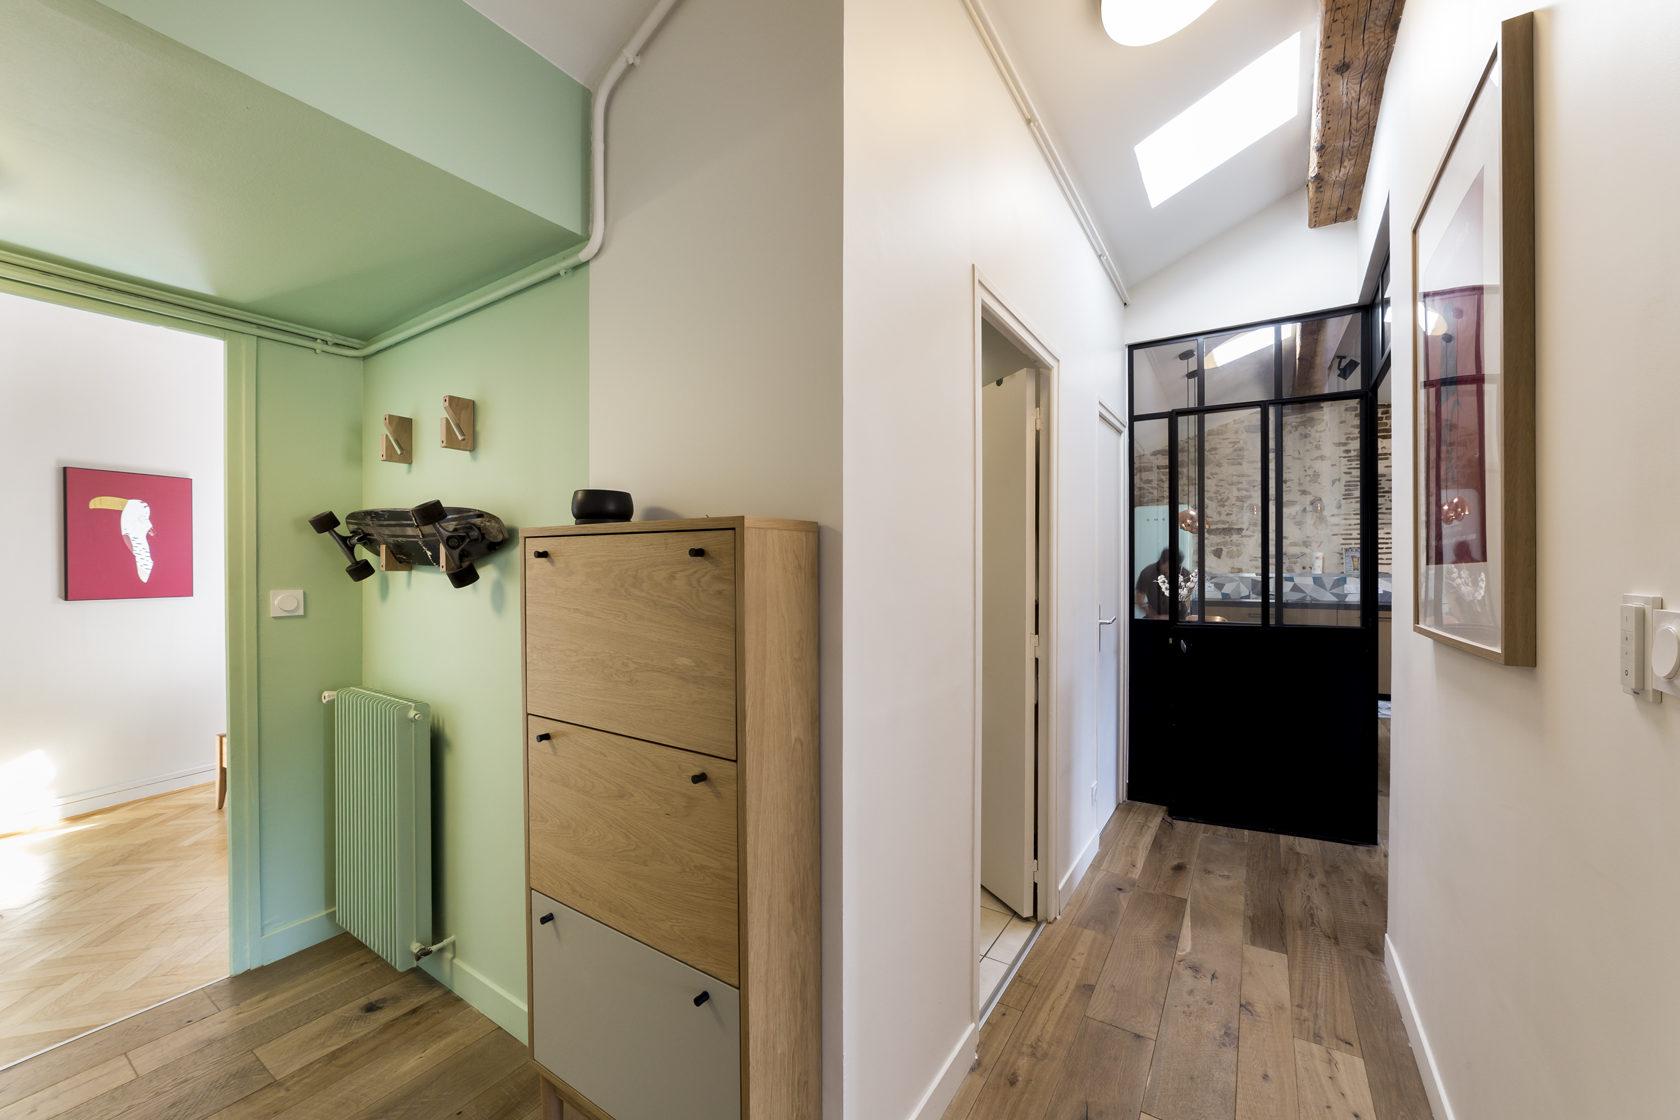 skea-designer-realisation-architecte-d-interieur-bleu-affluent-55